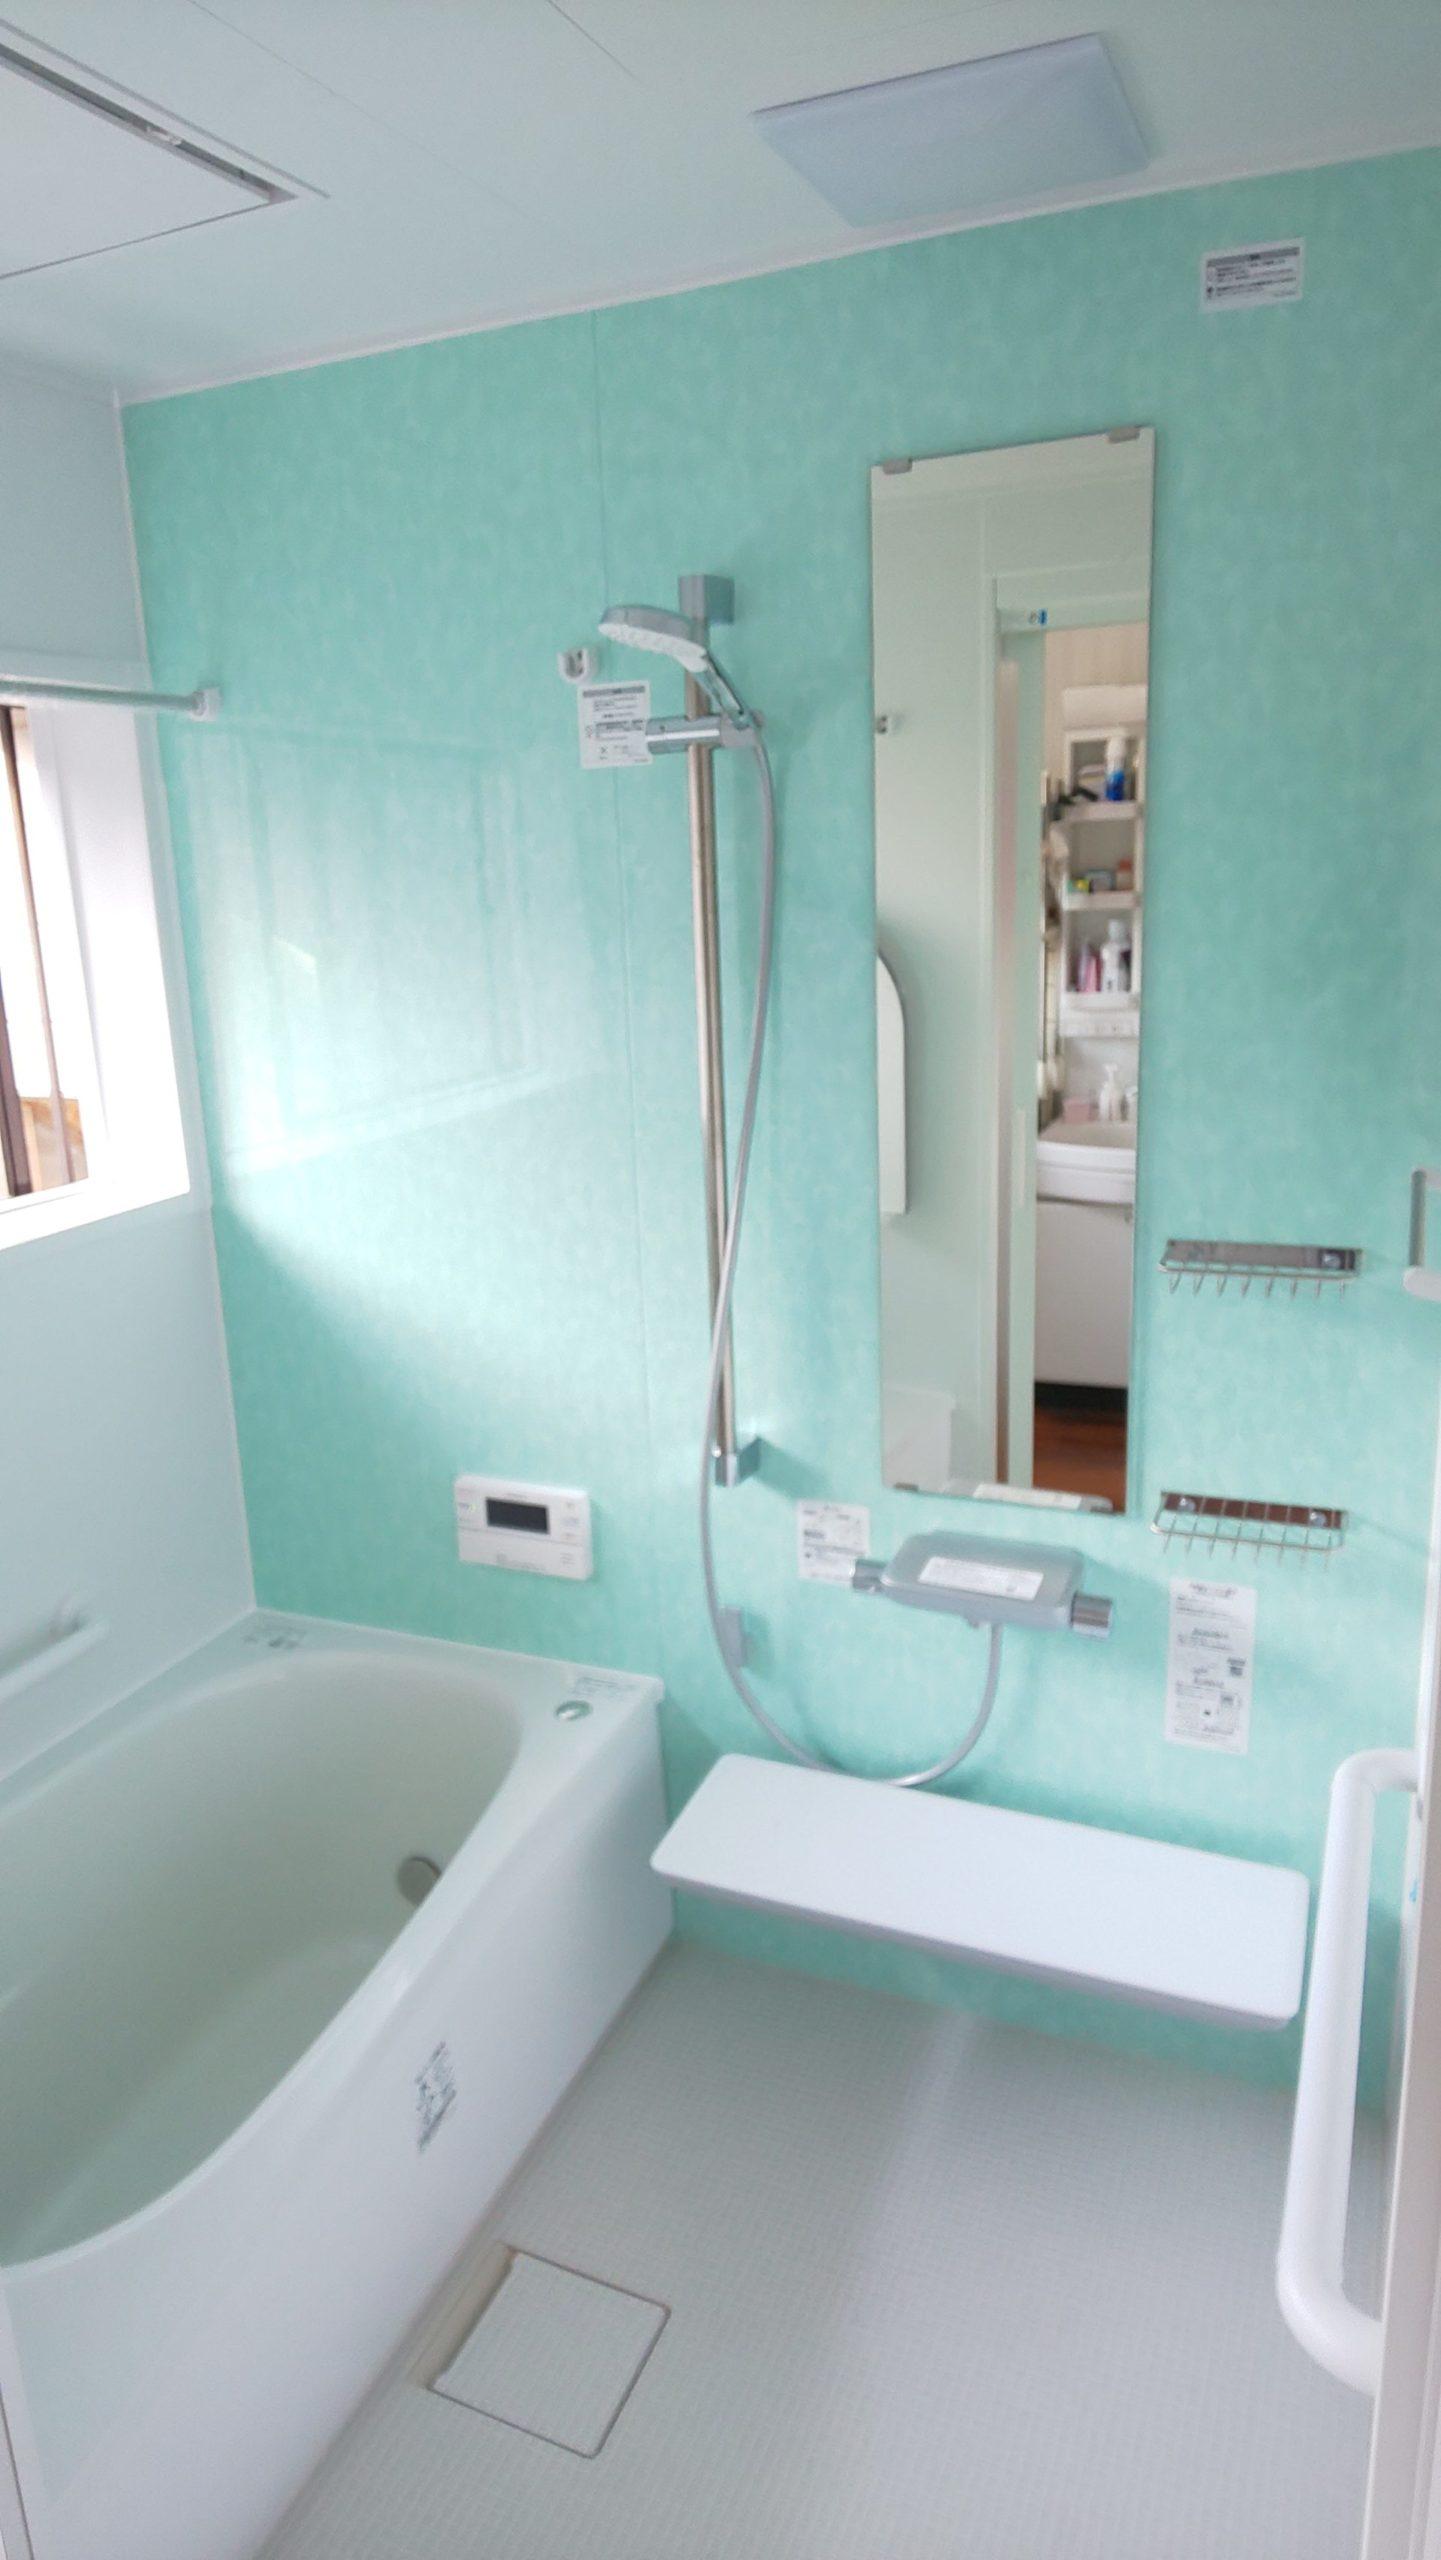 TOTOサザナ「床ワイパー洗浄」でお掃除ラクラク♬ 浴室・脱衣室暖房完備でヒートショック対策も!